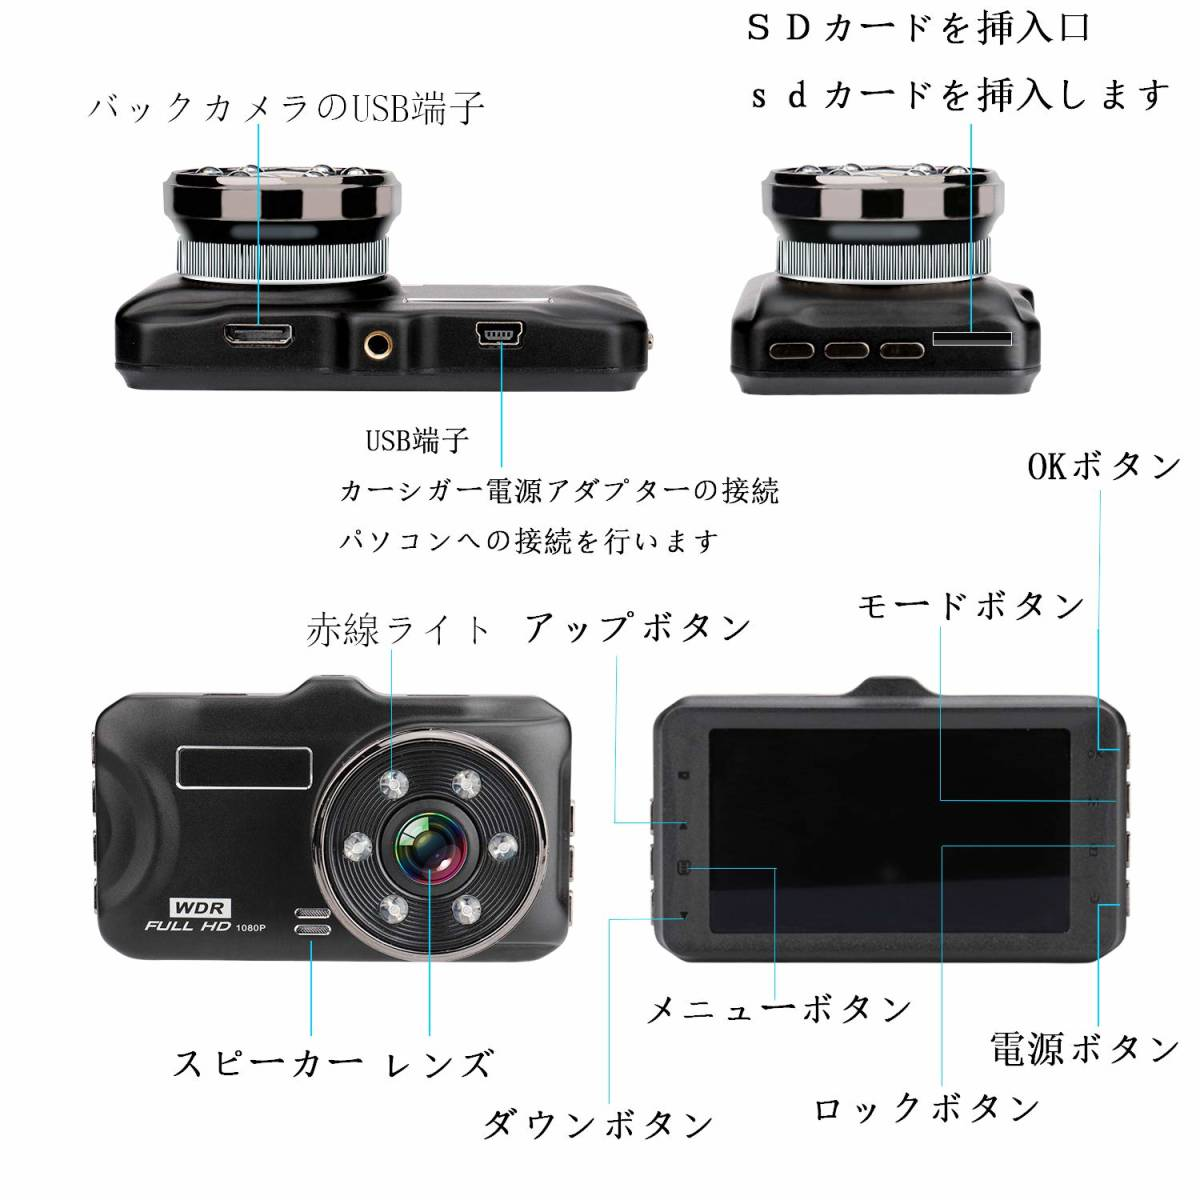 O951 新品 ドライブレコーダー 前後カメラ 32GB SDカード付き 1080P フルHD 1800万画素 3インチ 夜間撮影 170°広視野角 常時録画_画像5